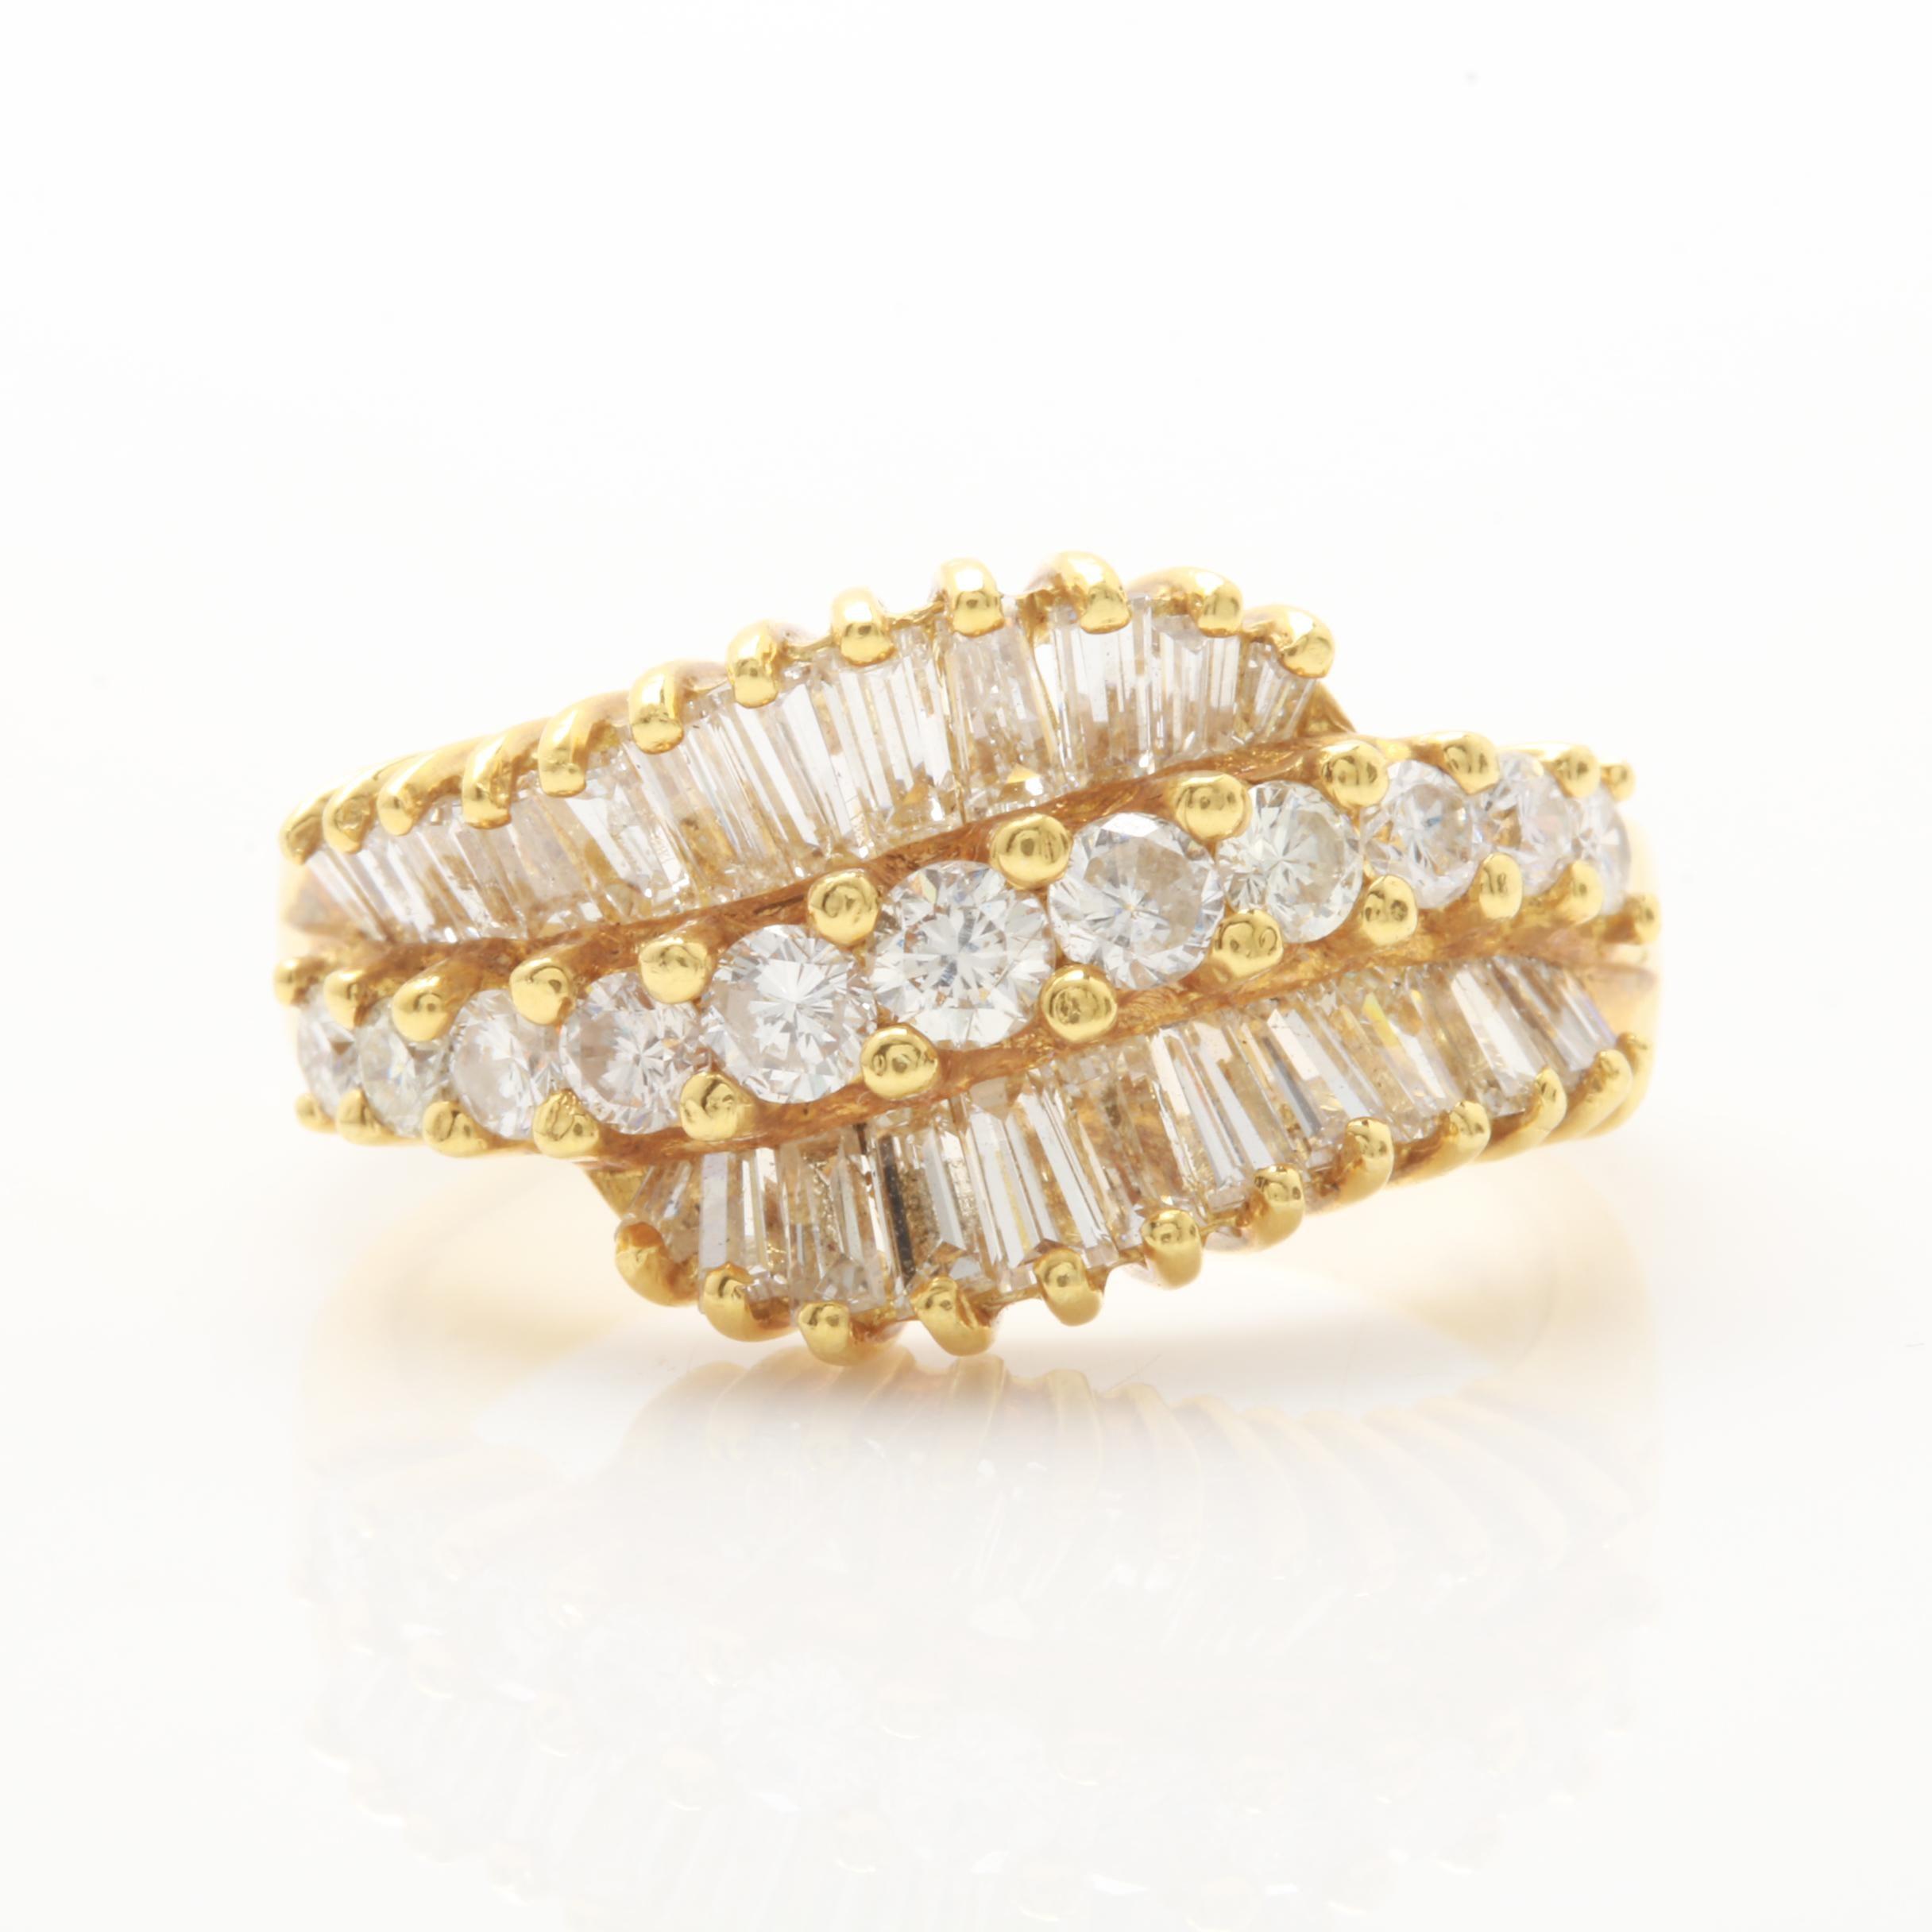 18K Yellow Gold 1.66 CTW Diamond Ring